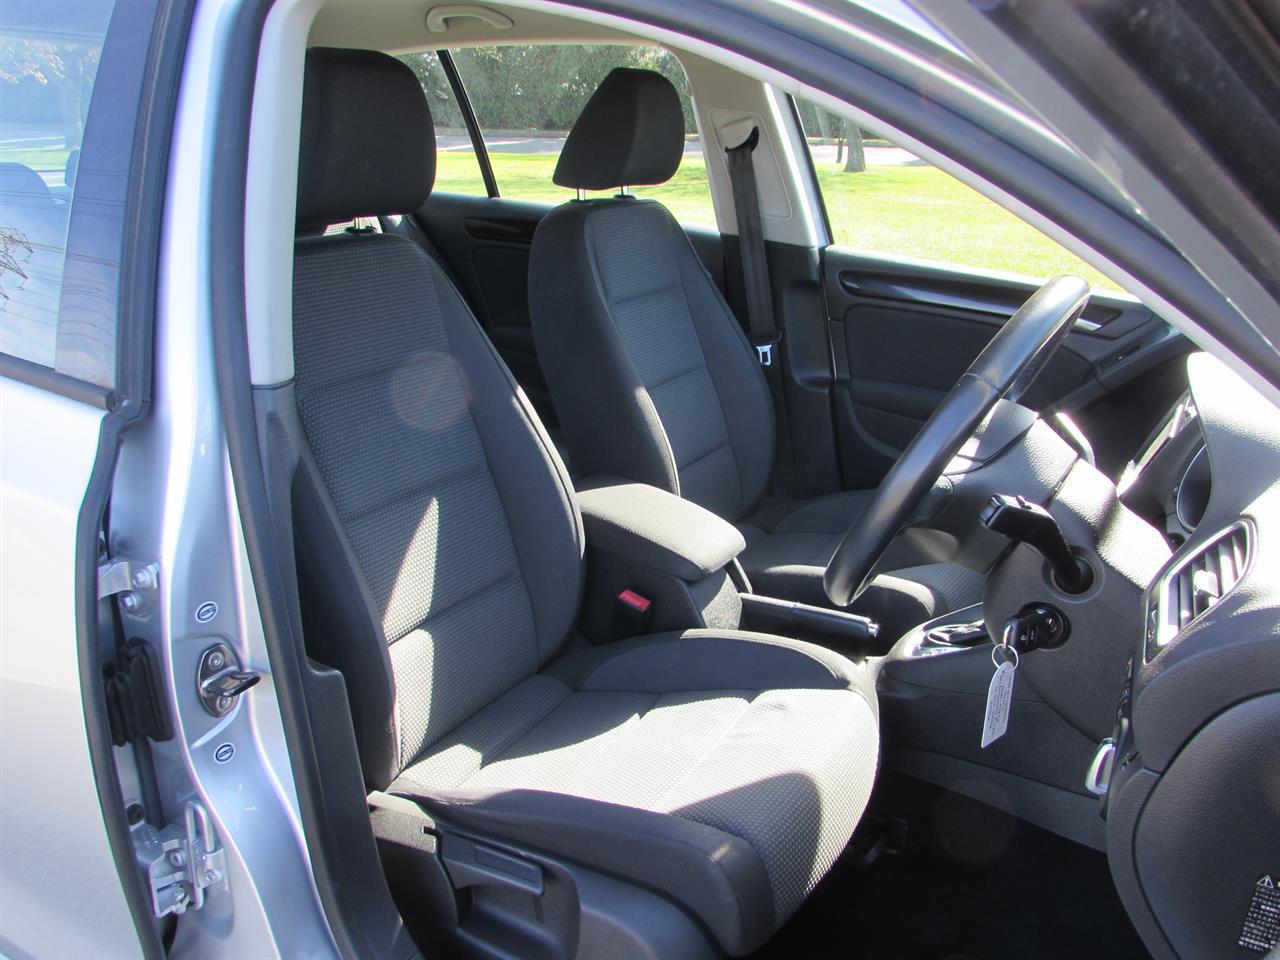 2011 Volkswagen GOLF | only $47 weekly